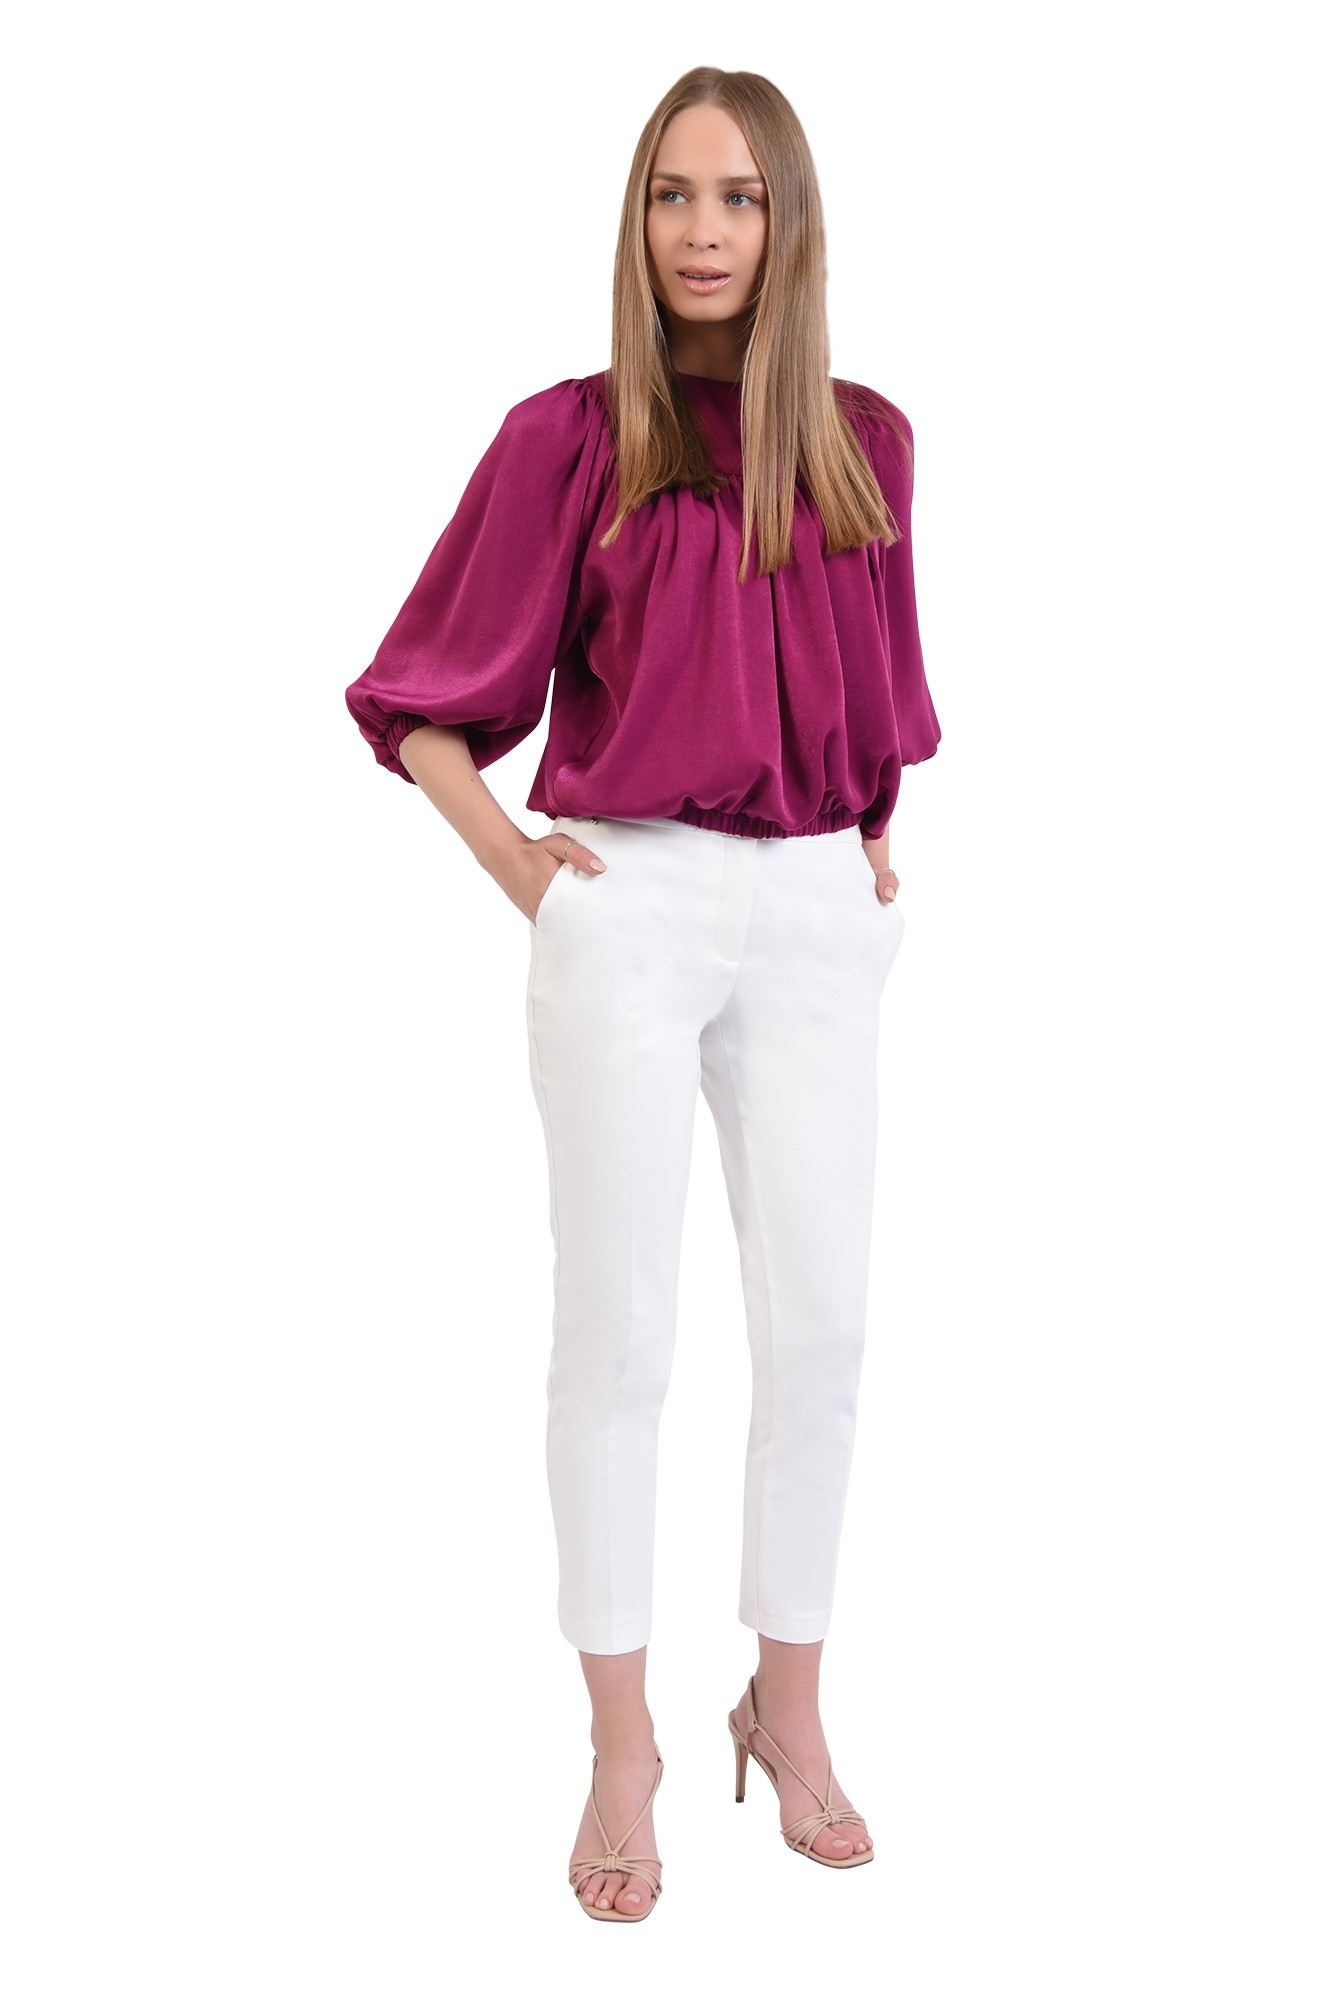 360 - bluza eleganta, din satin, cu platca, maneci bufante